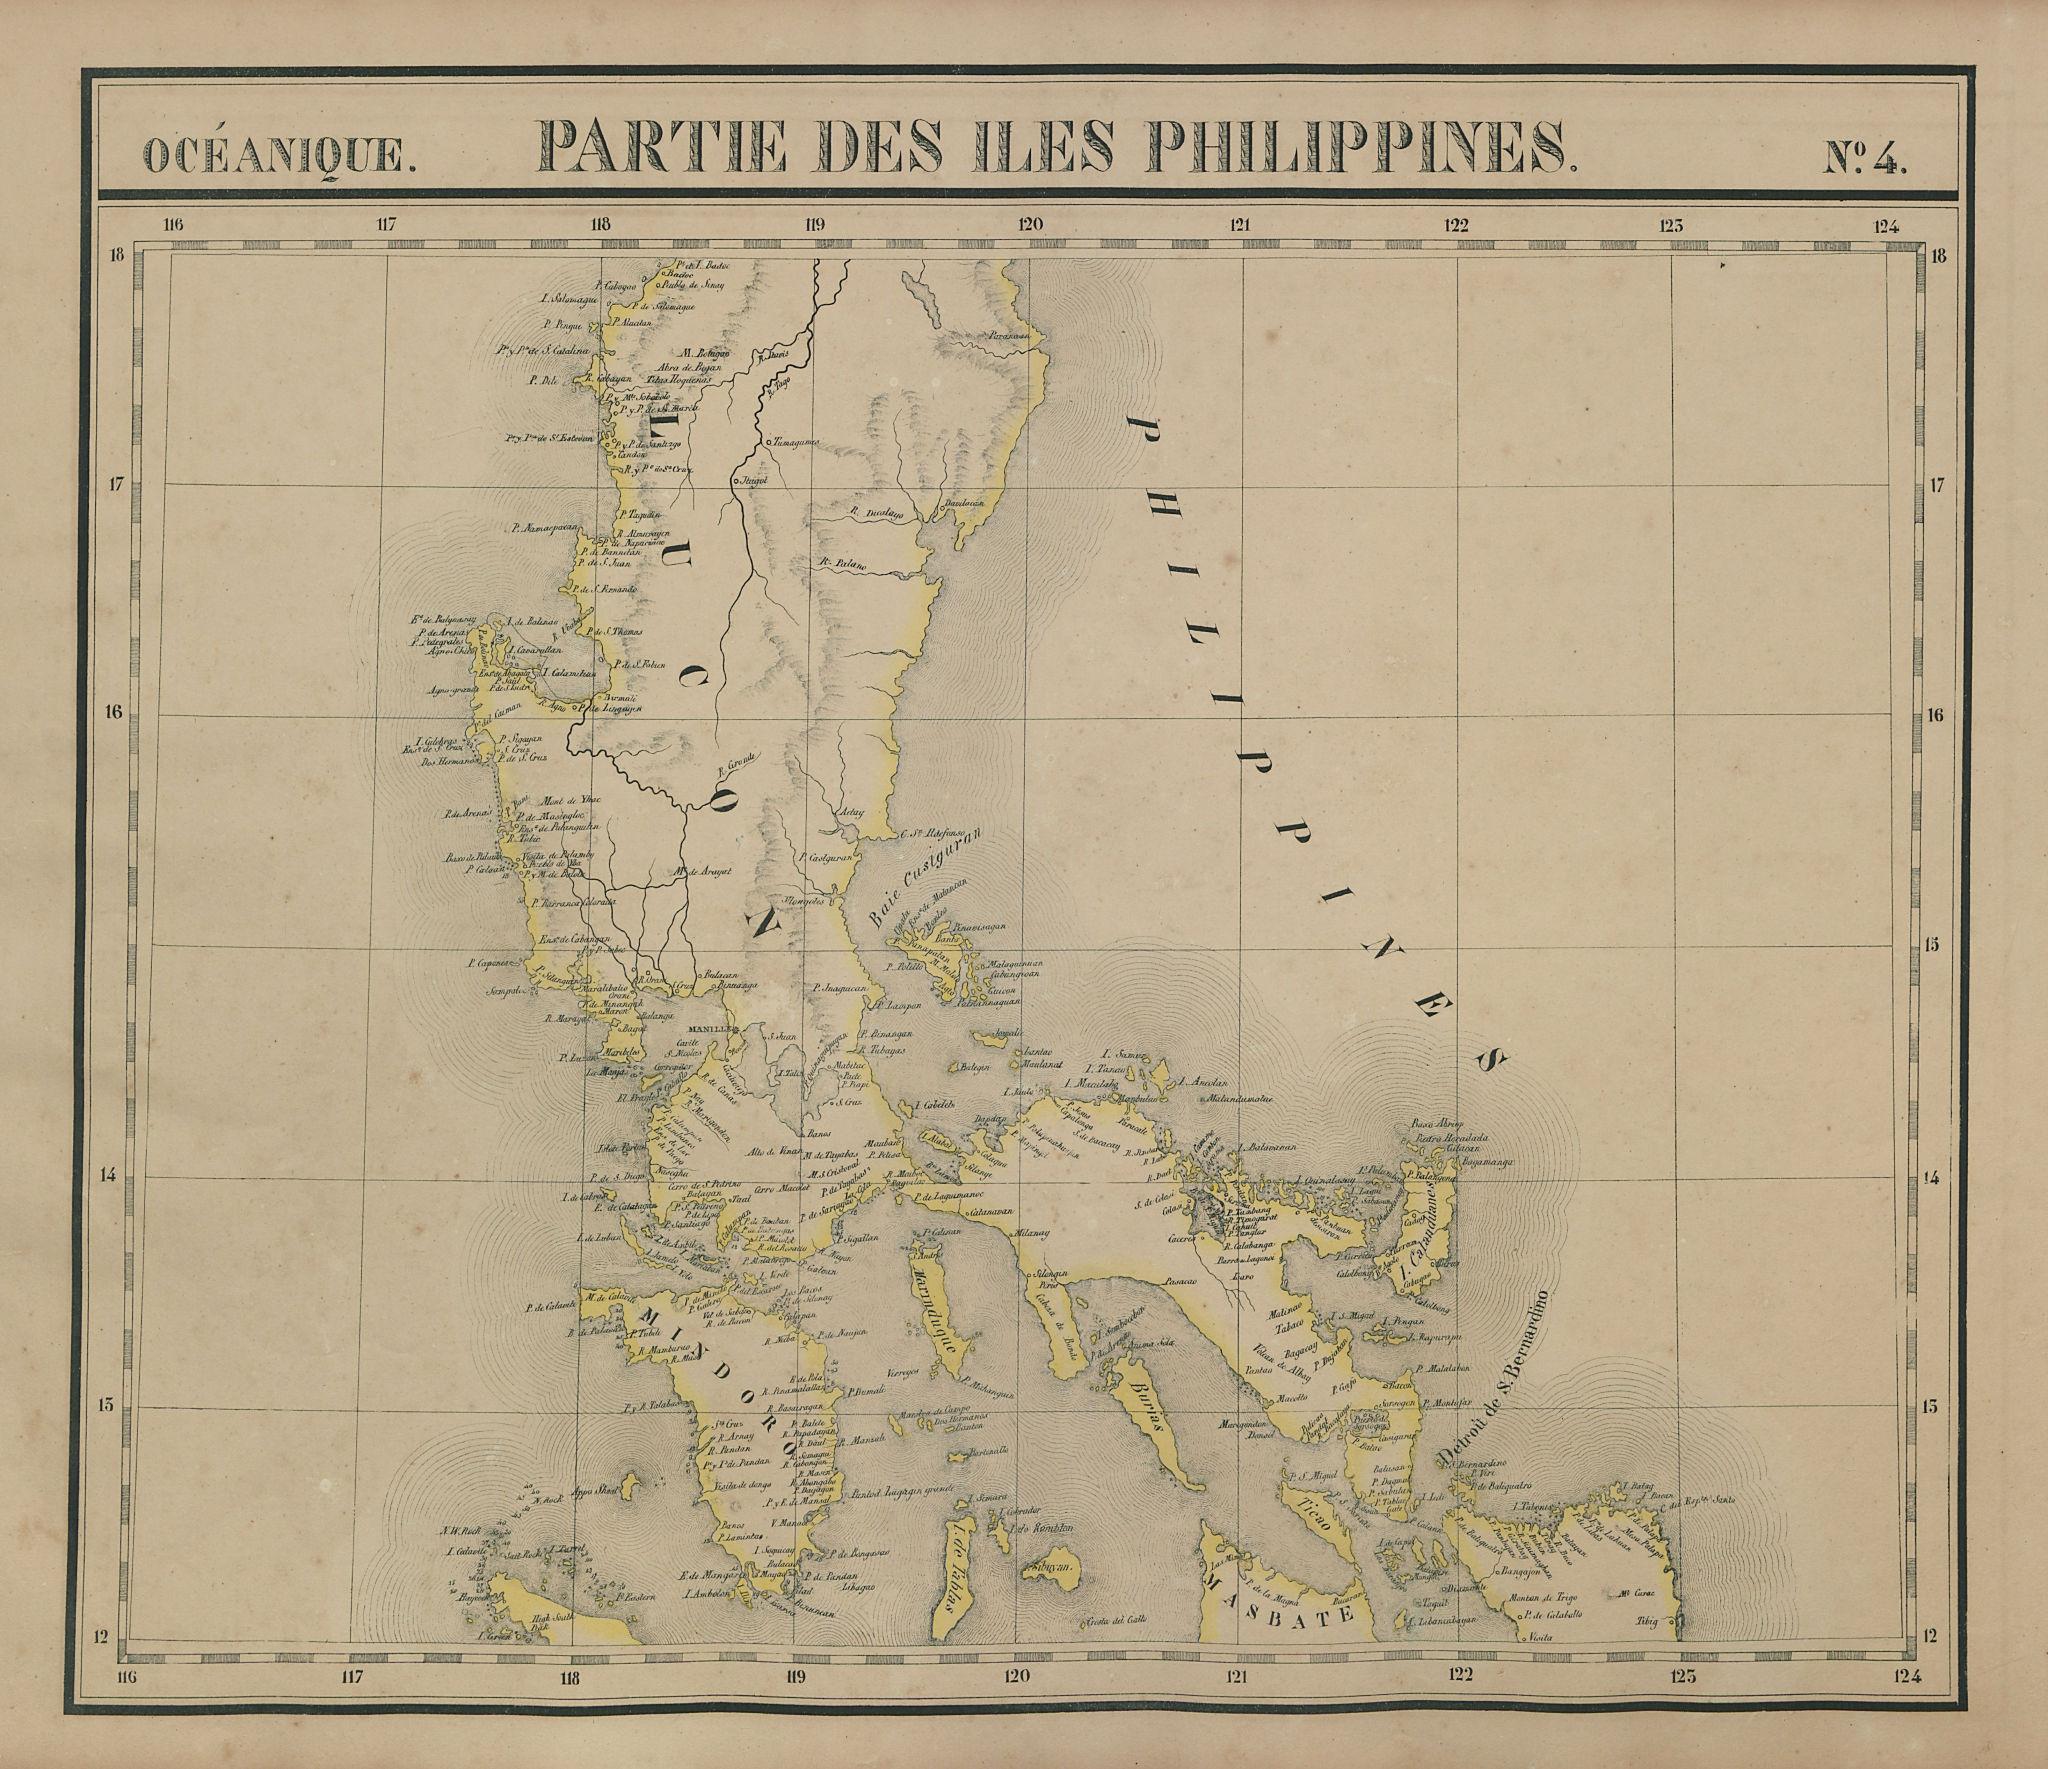 Océanique. Partie des Iles Philippines #4. Luzon Mindoro. VANDERMAELEN 1827 map